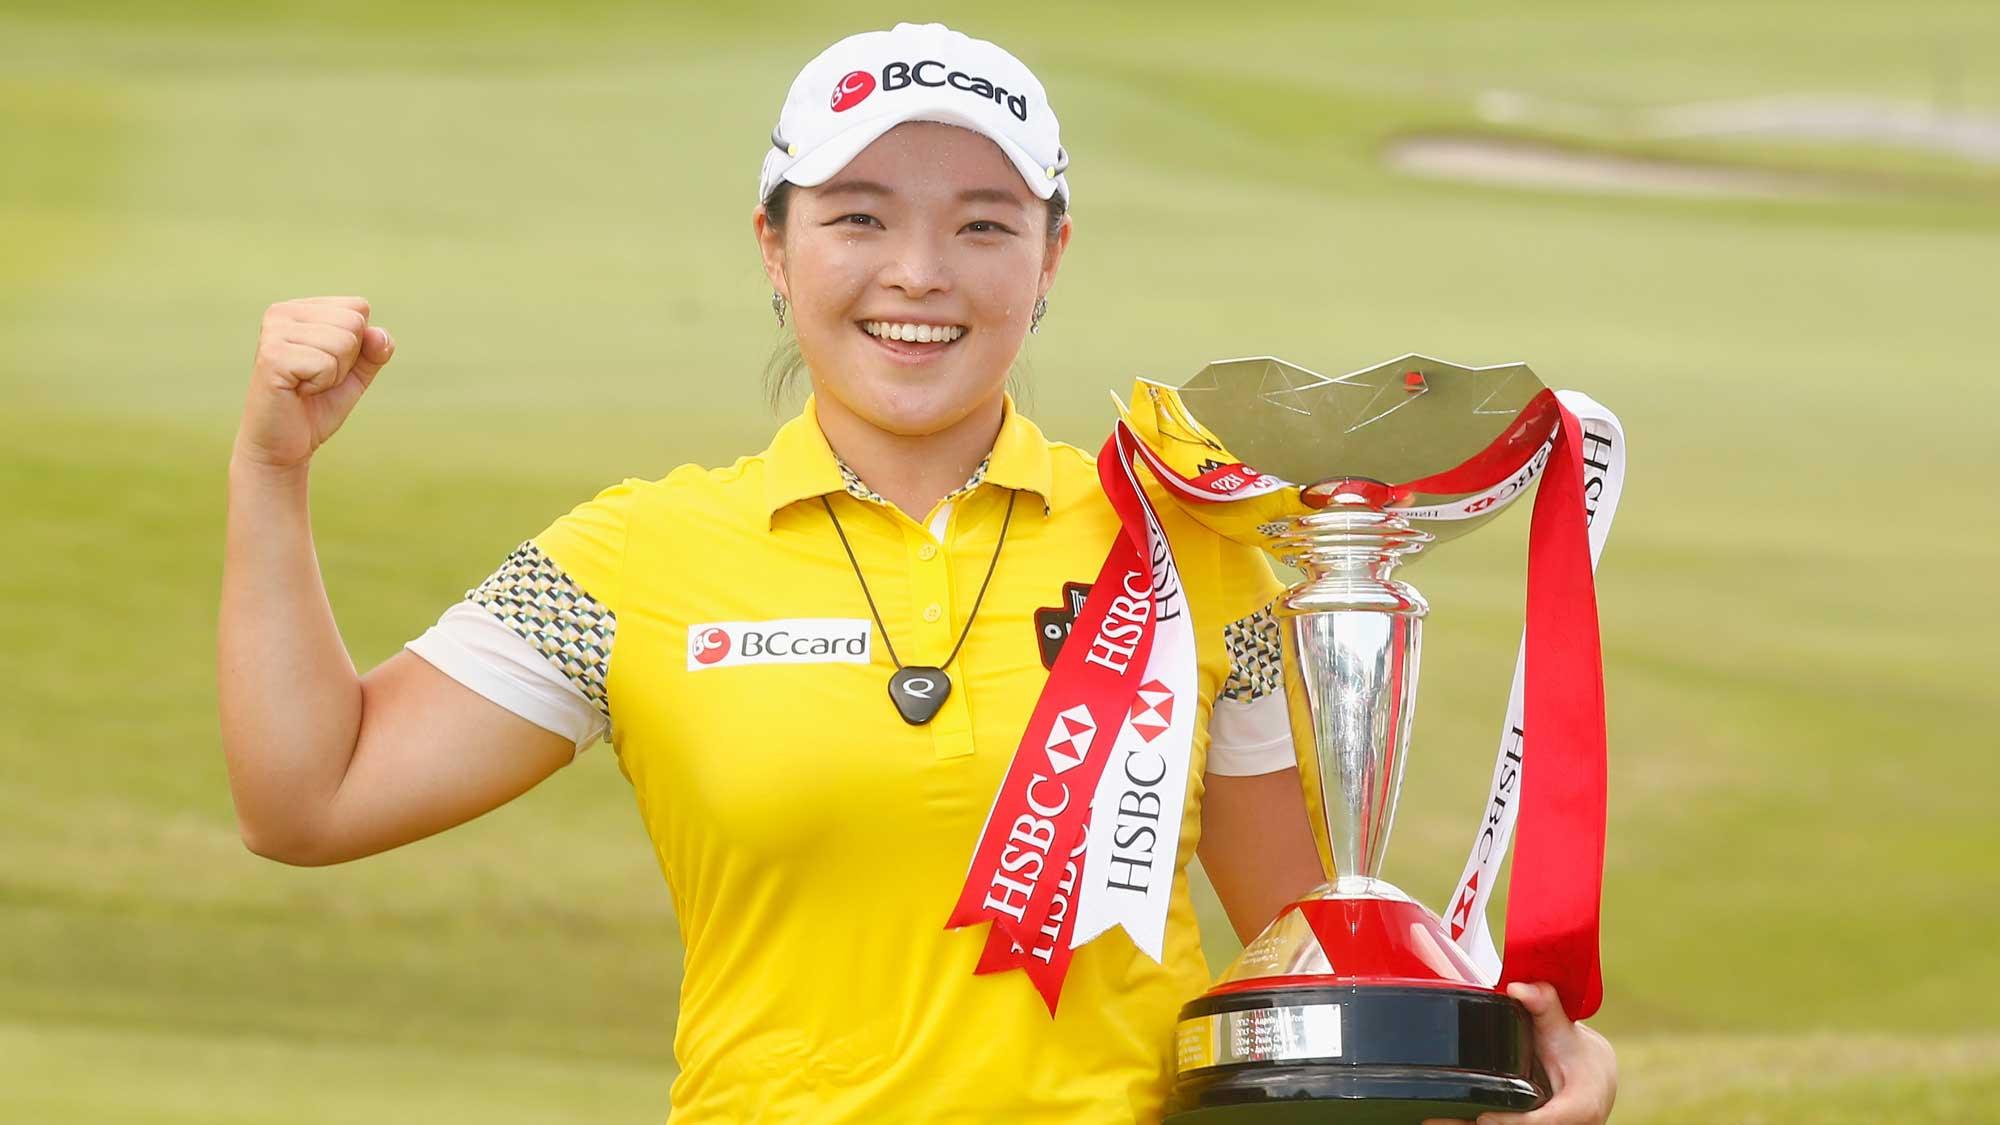 Defending champion HaNa Jang